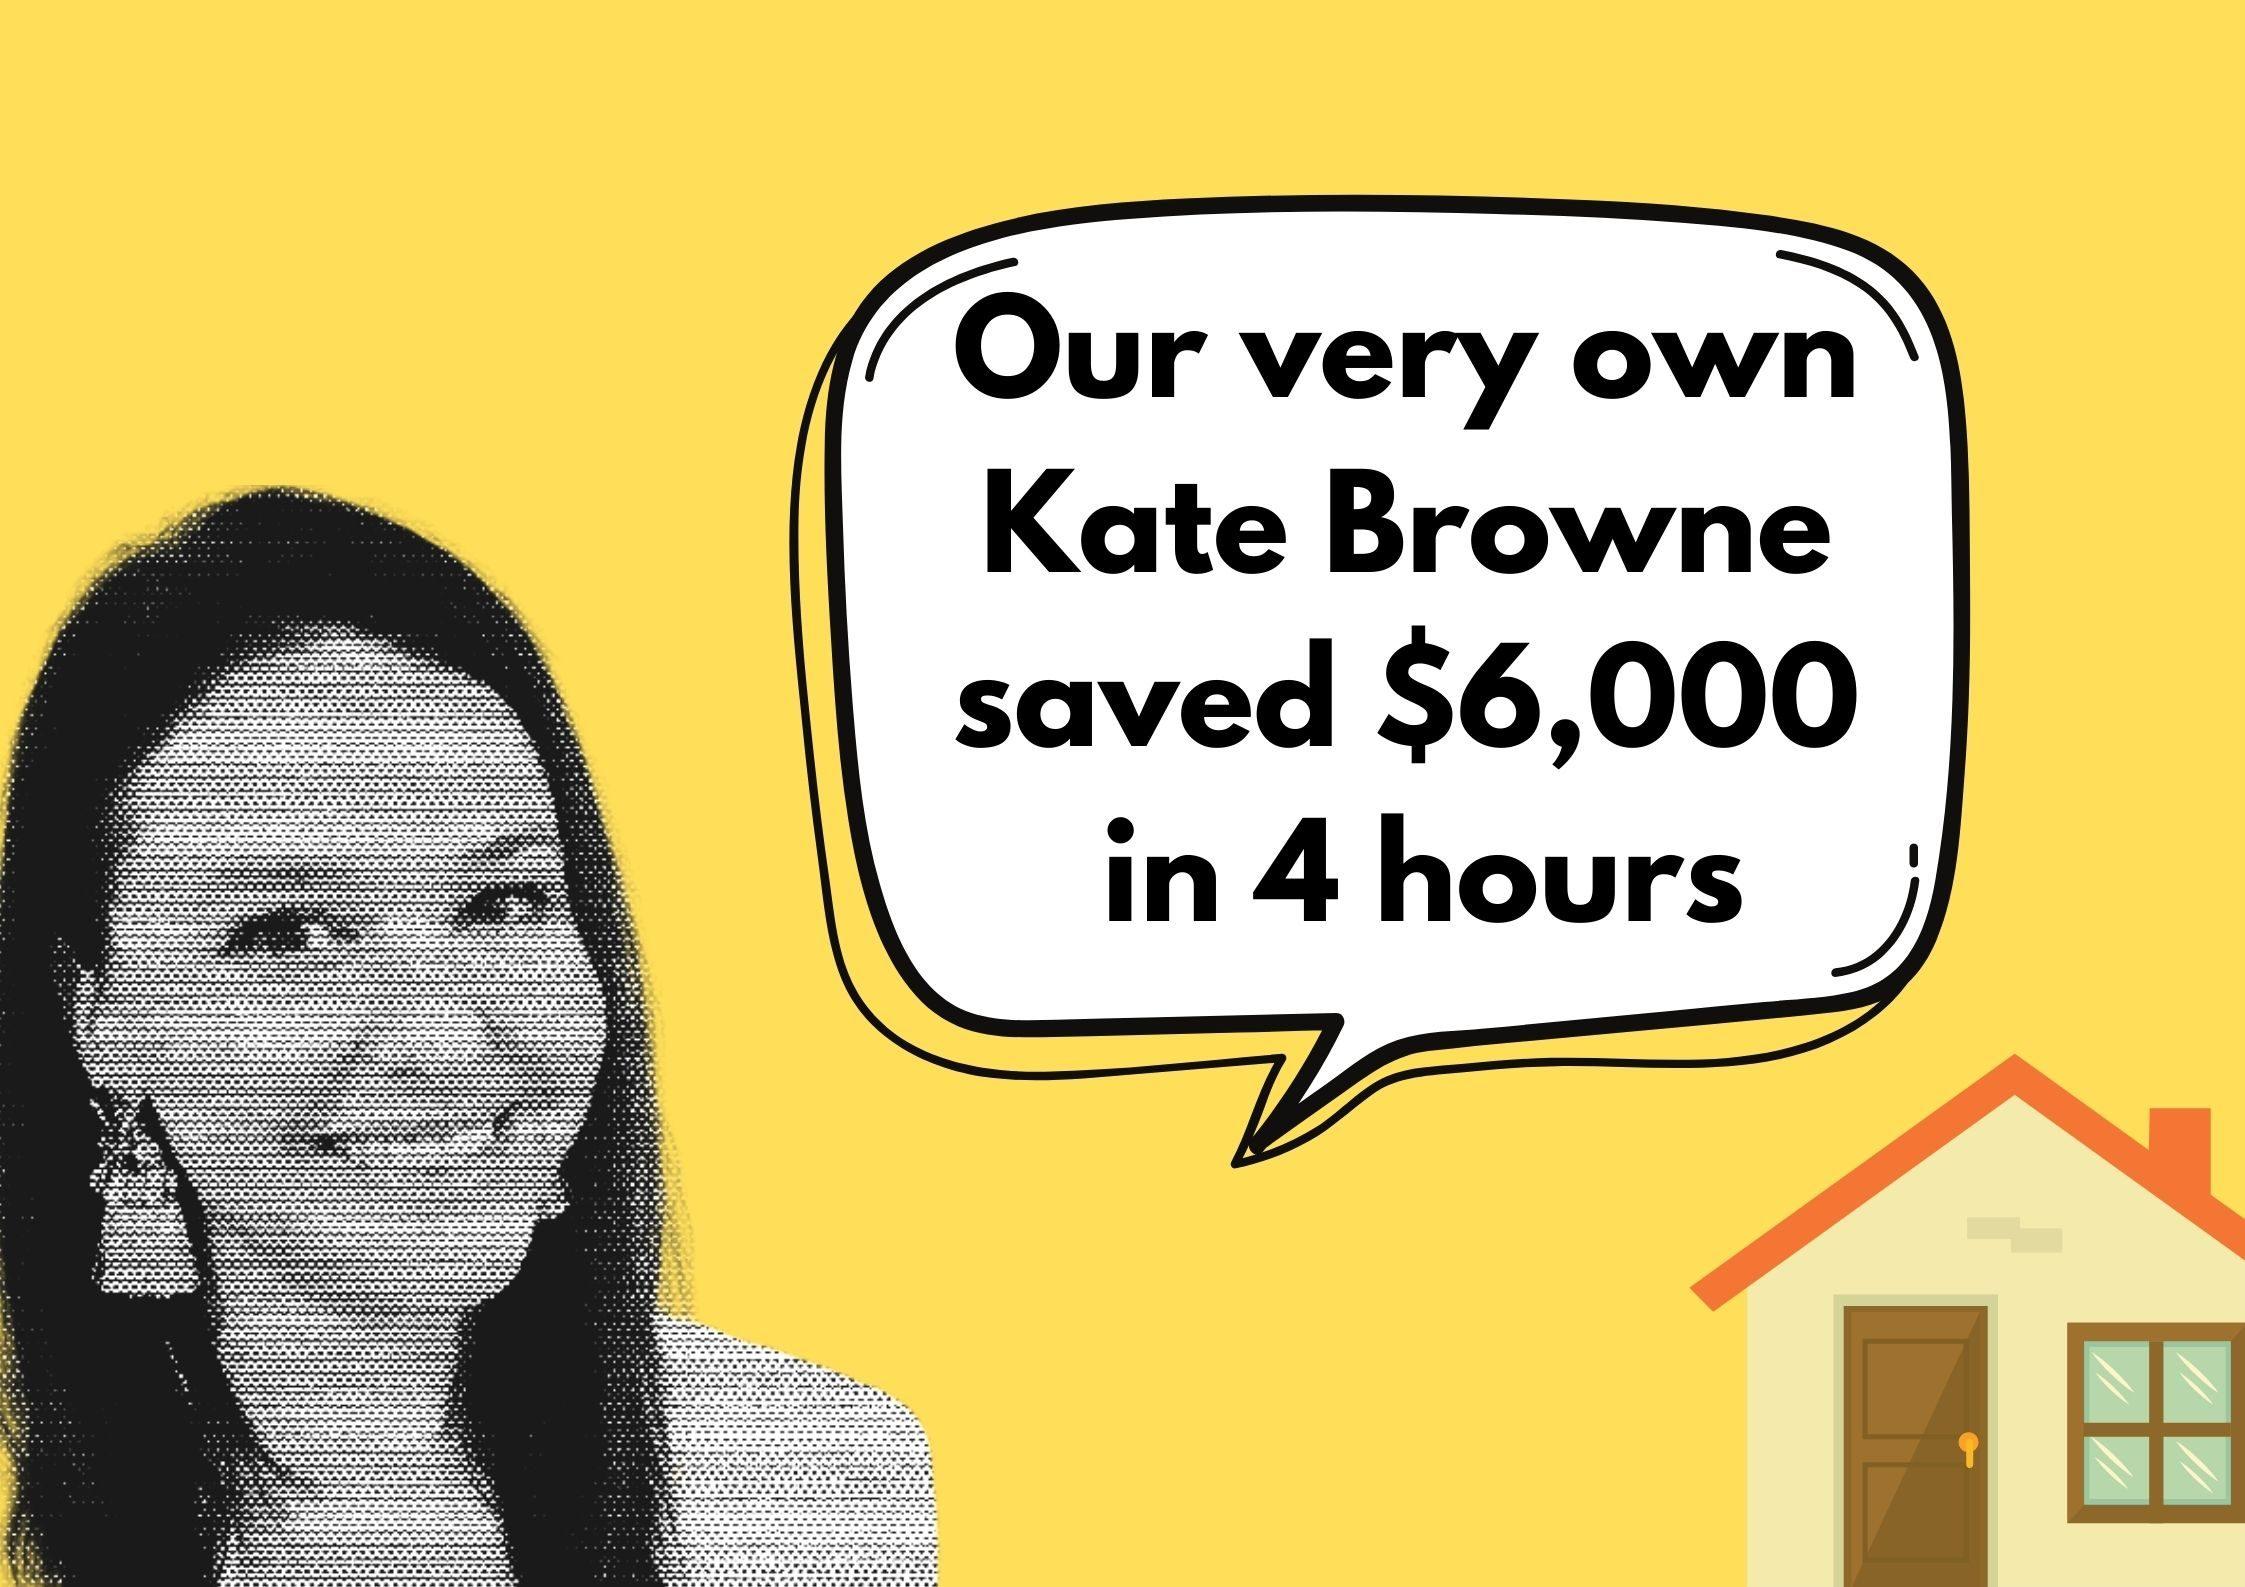 Save $6,000 in 4 hours, Sarah Megginson, senior editor, money